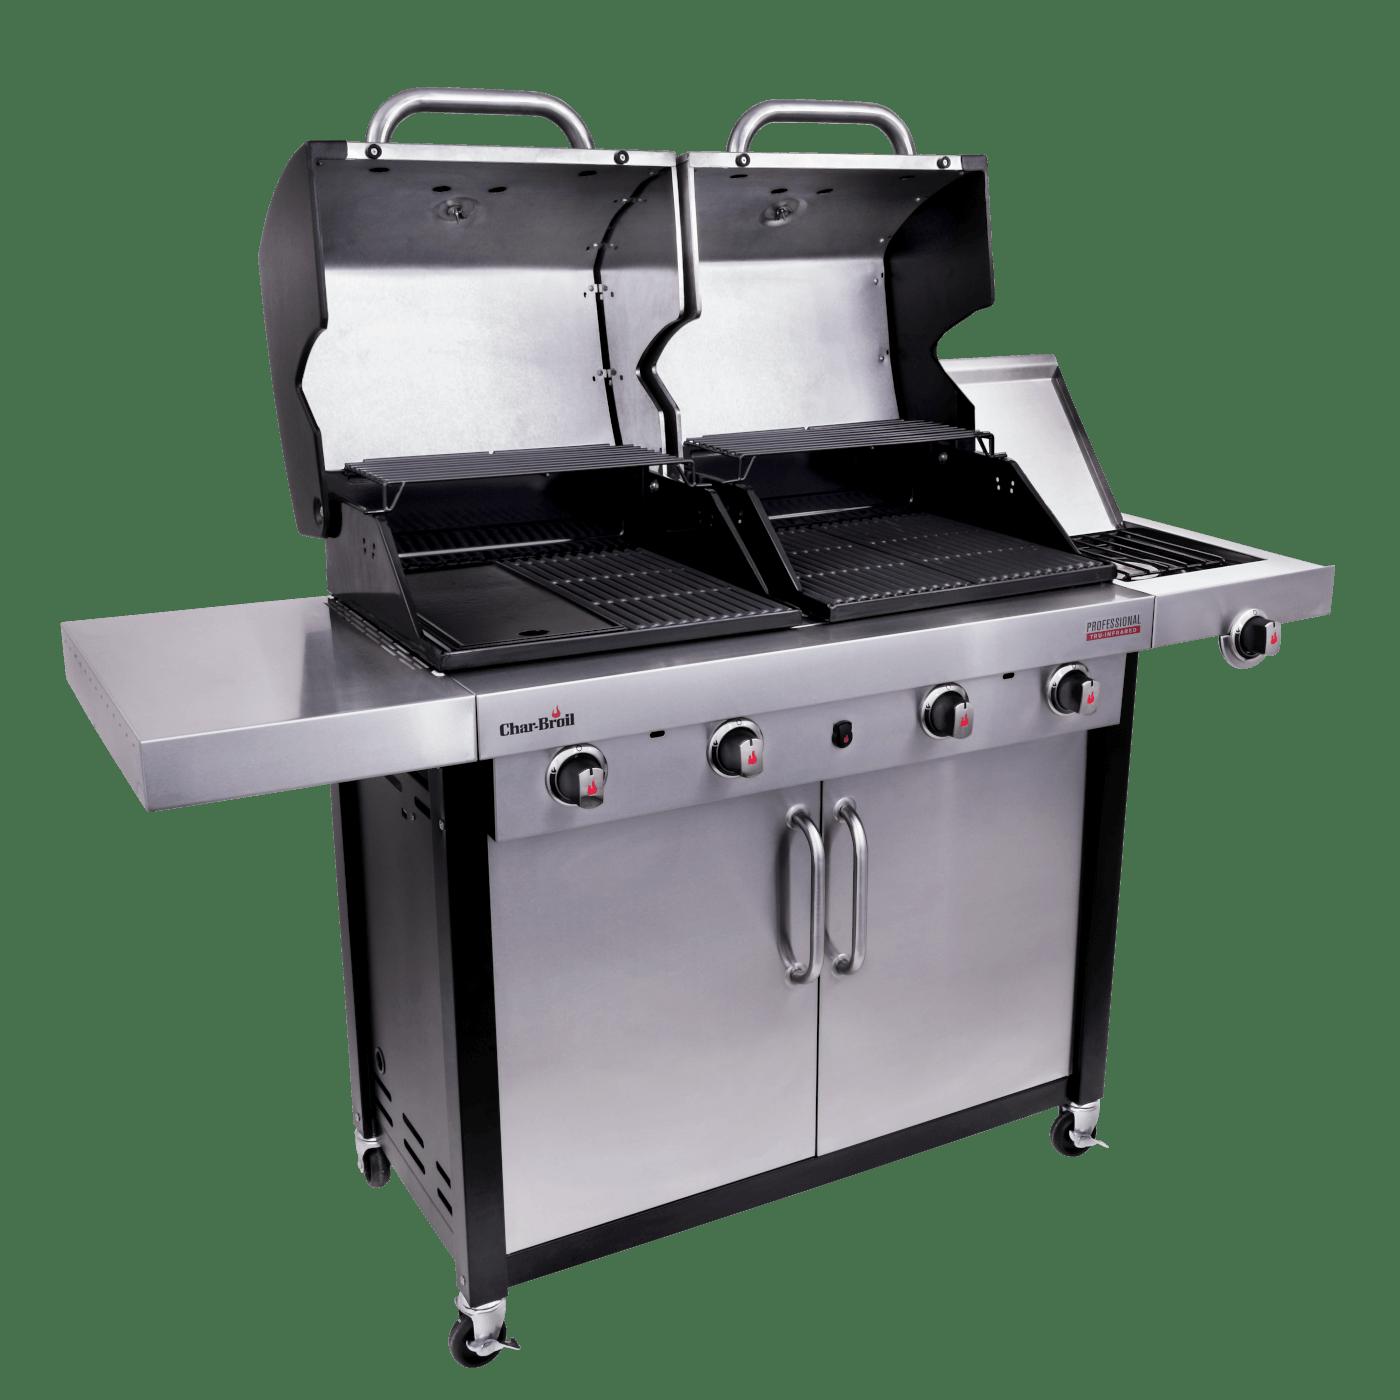 Emitter Professional 4B Char-Broil Grillrost